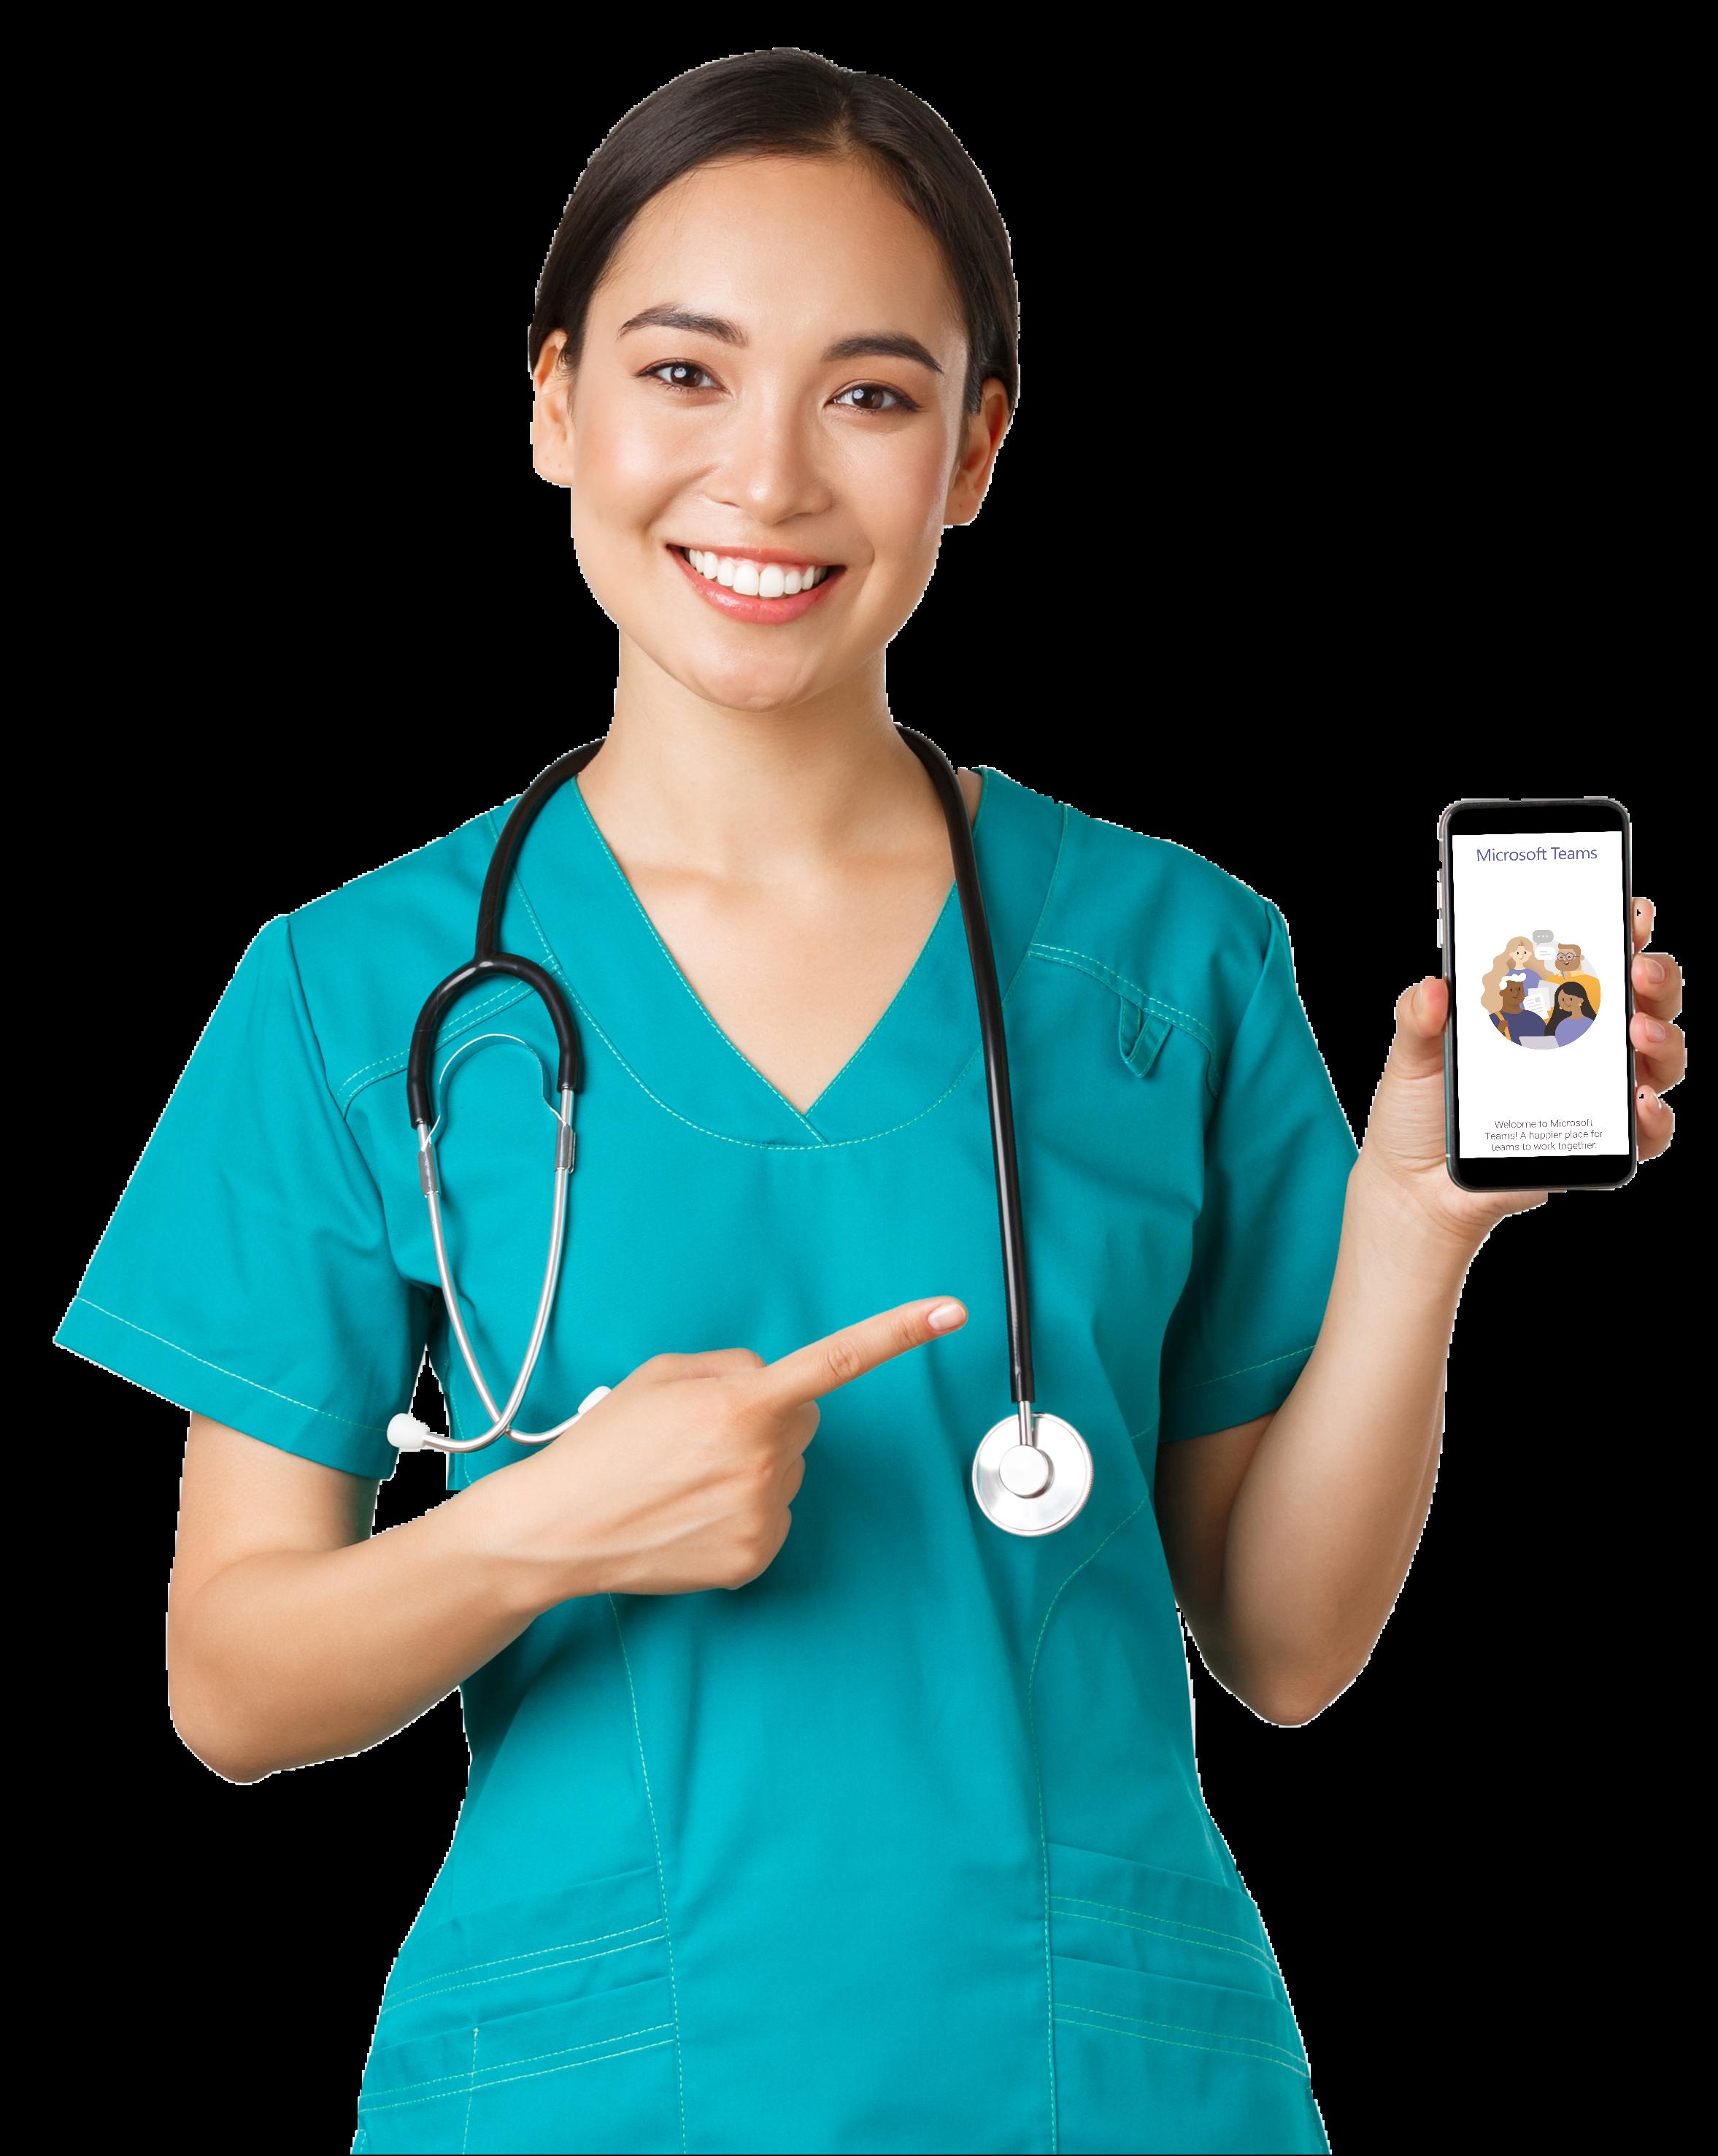 woman doctor phone mobile MS teams